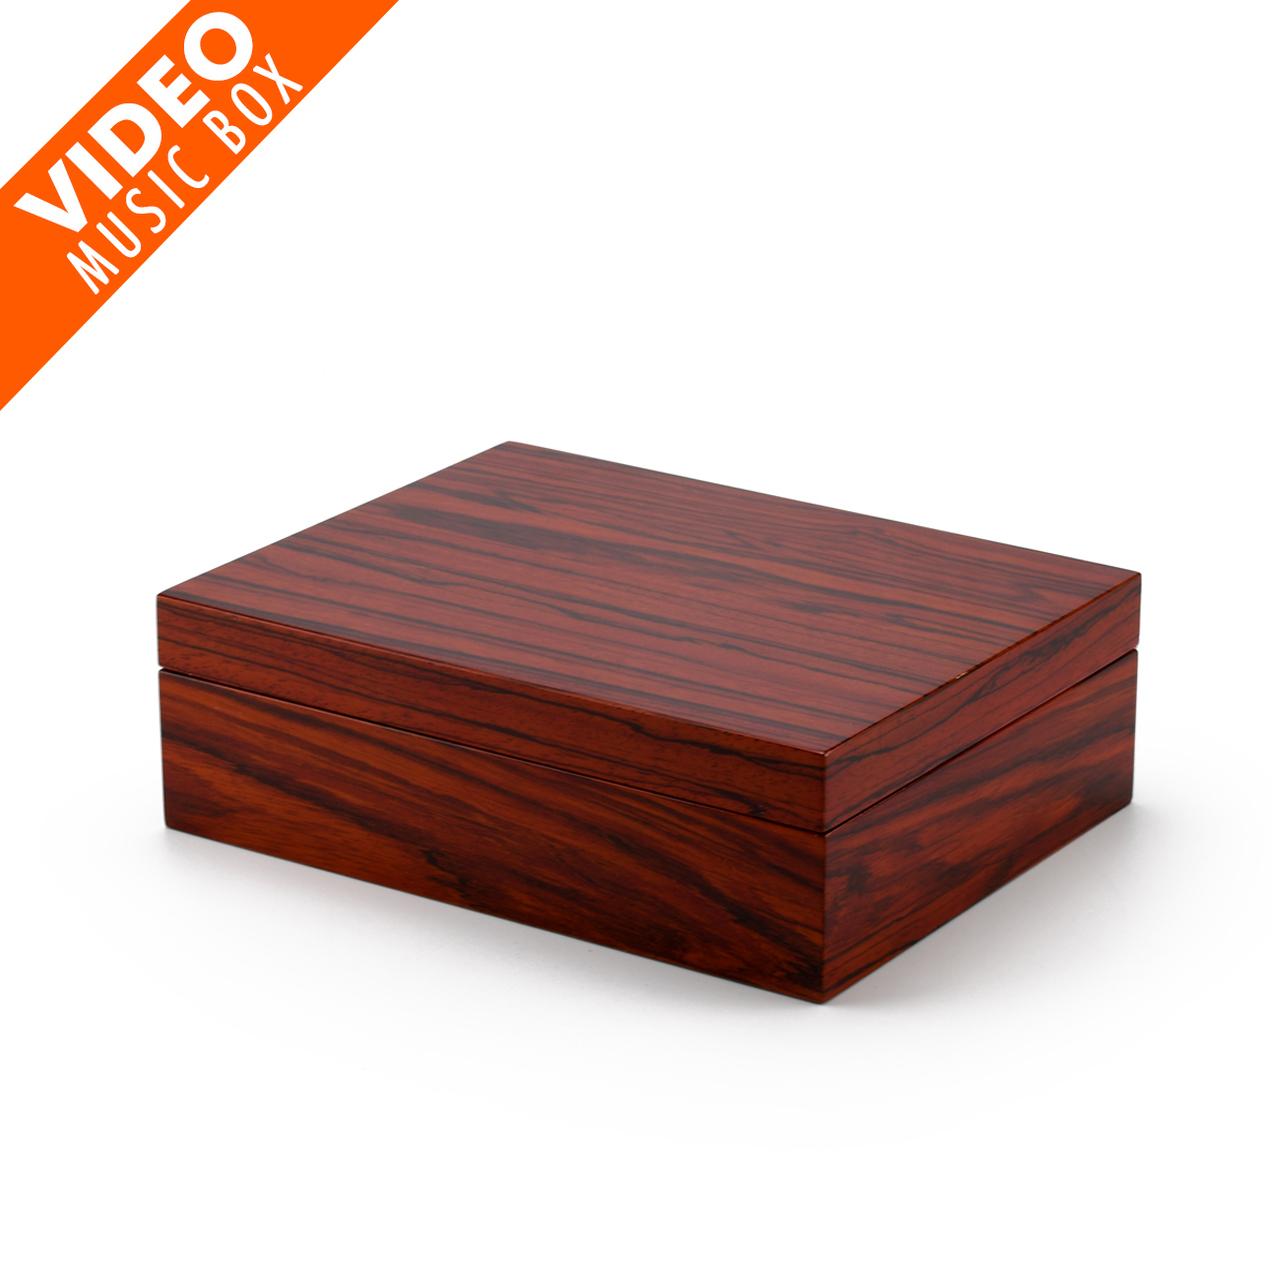 Ultra-Sleek Hi Gloss Zebra Striped Wood Finish 7 LCD Video Jewelry Box